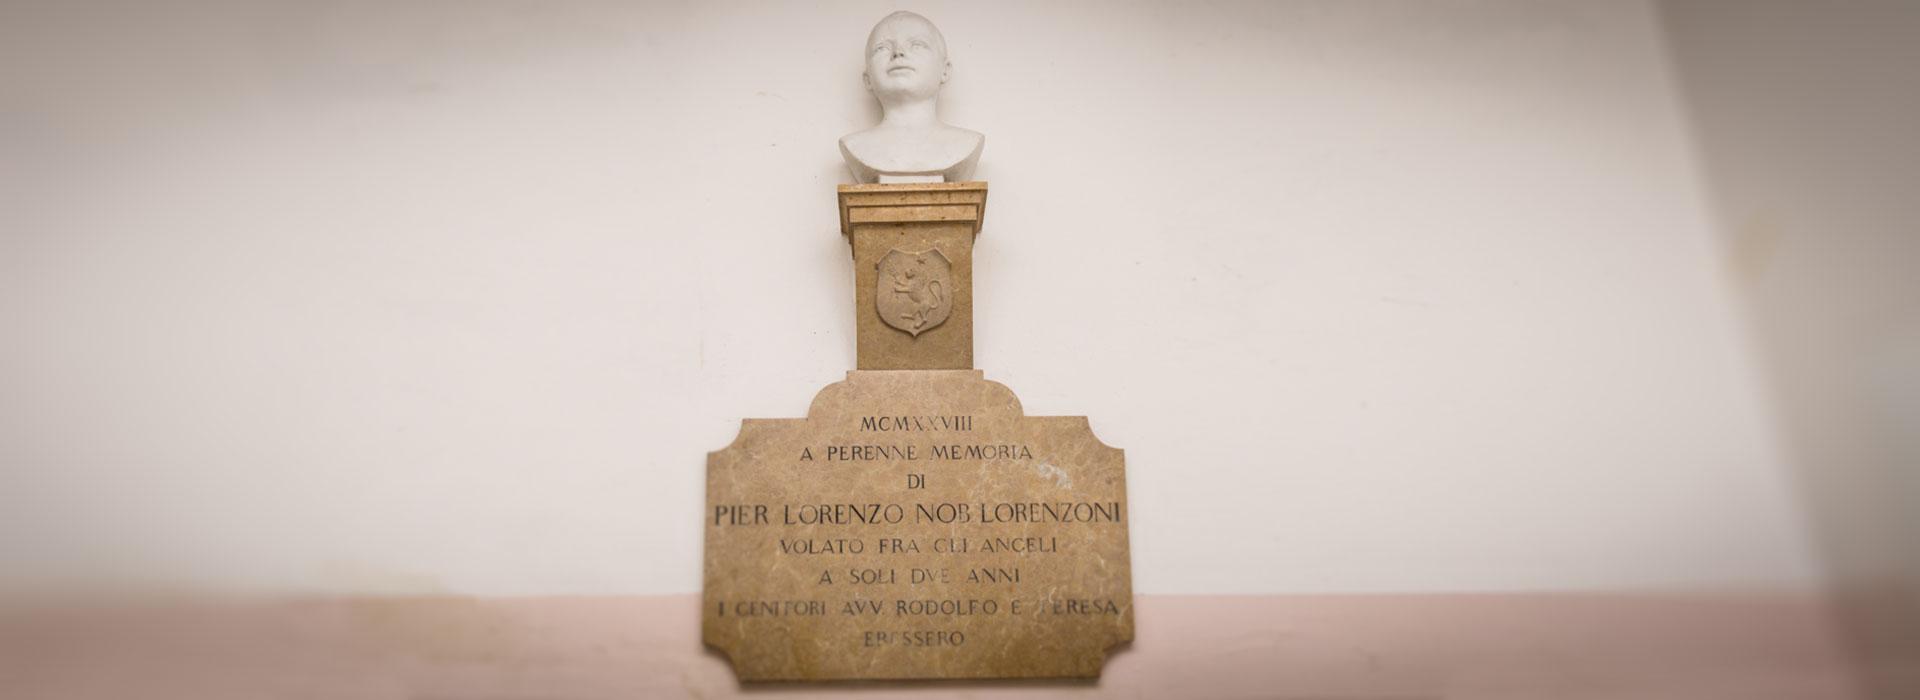 pier-lorenzo-nob-lorenzoni